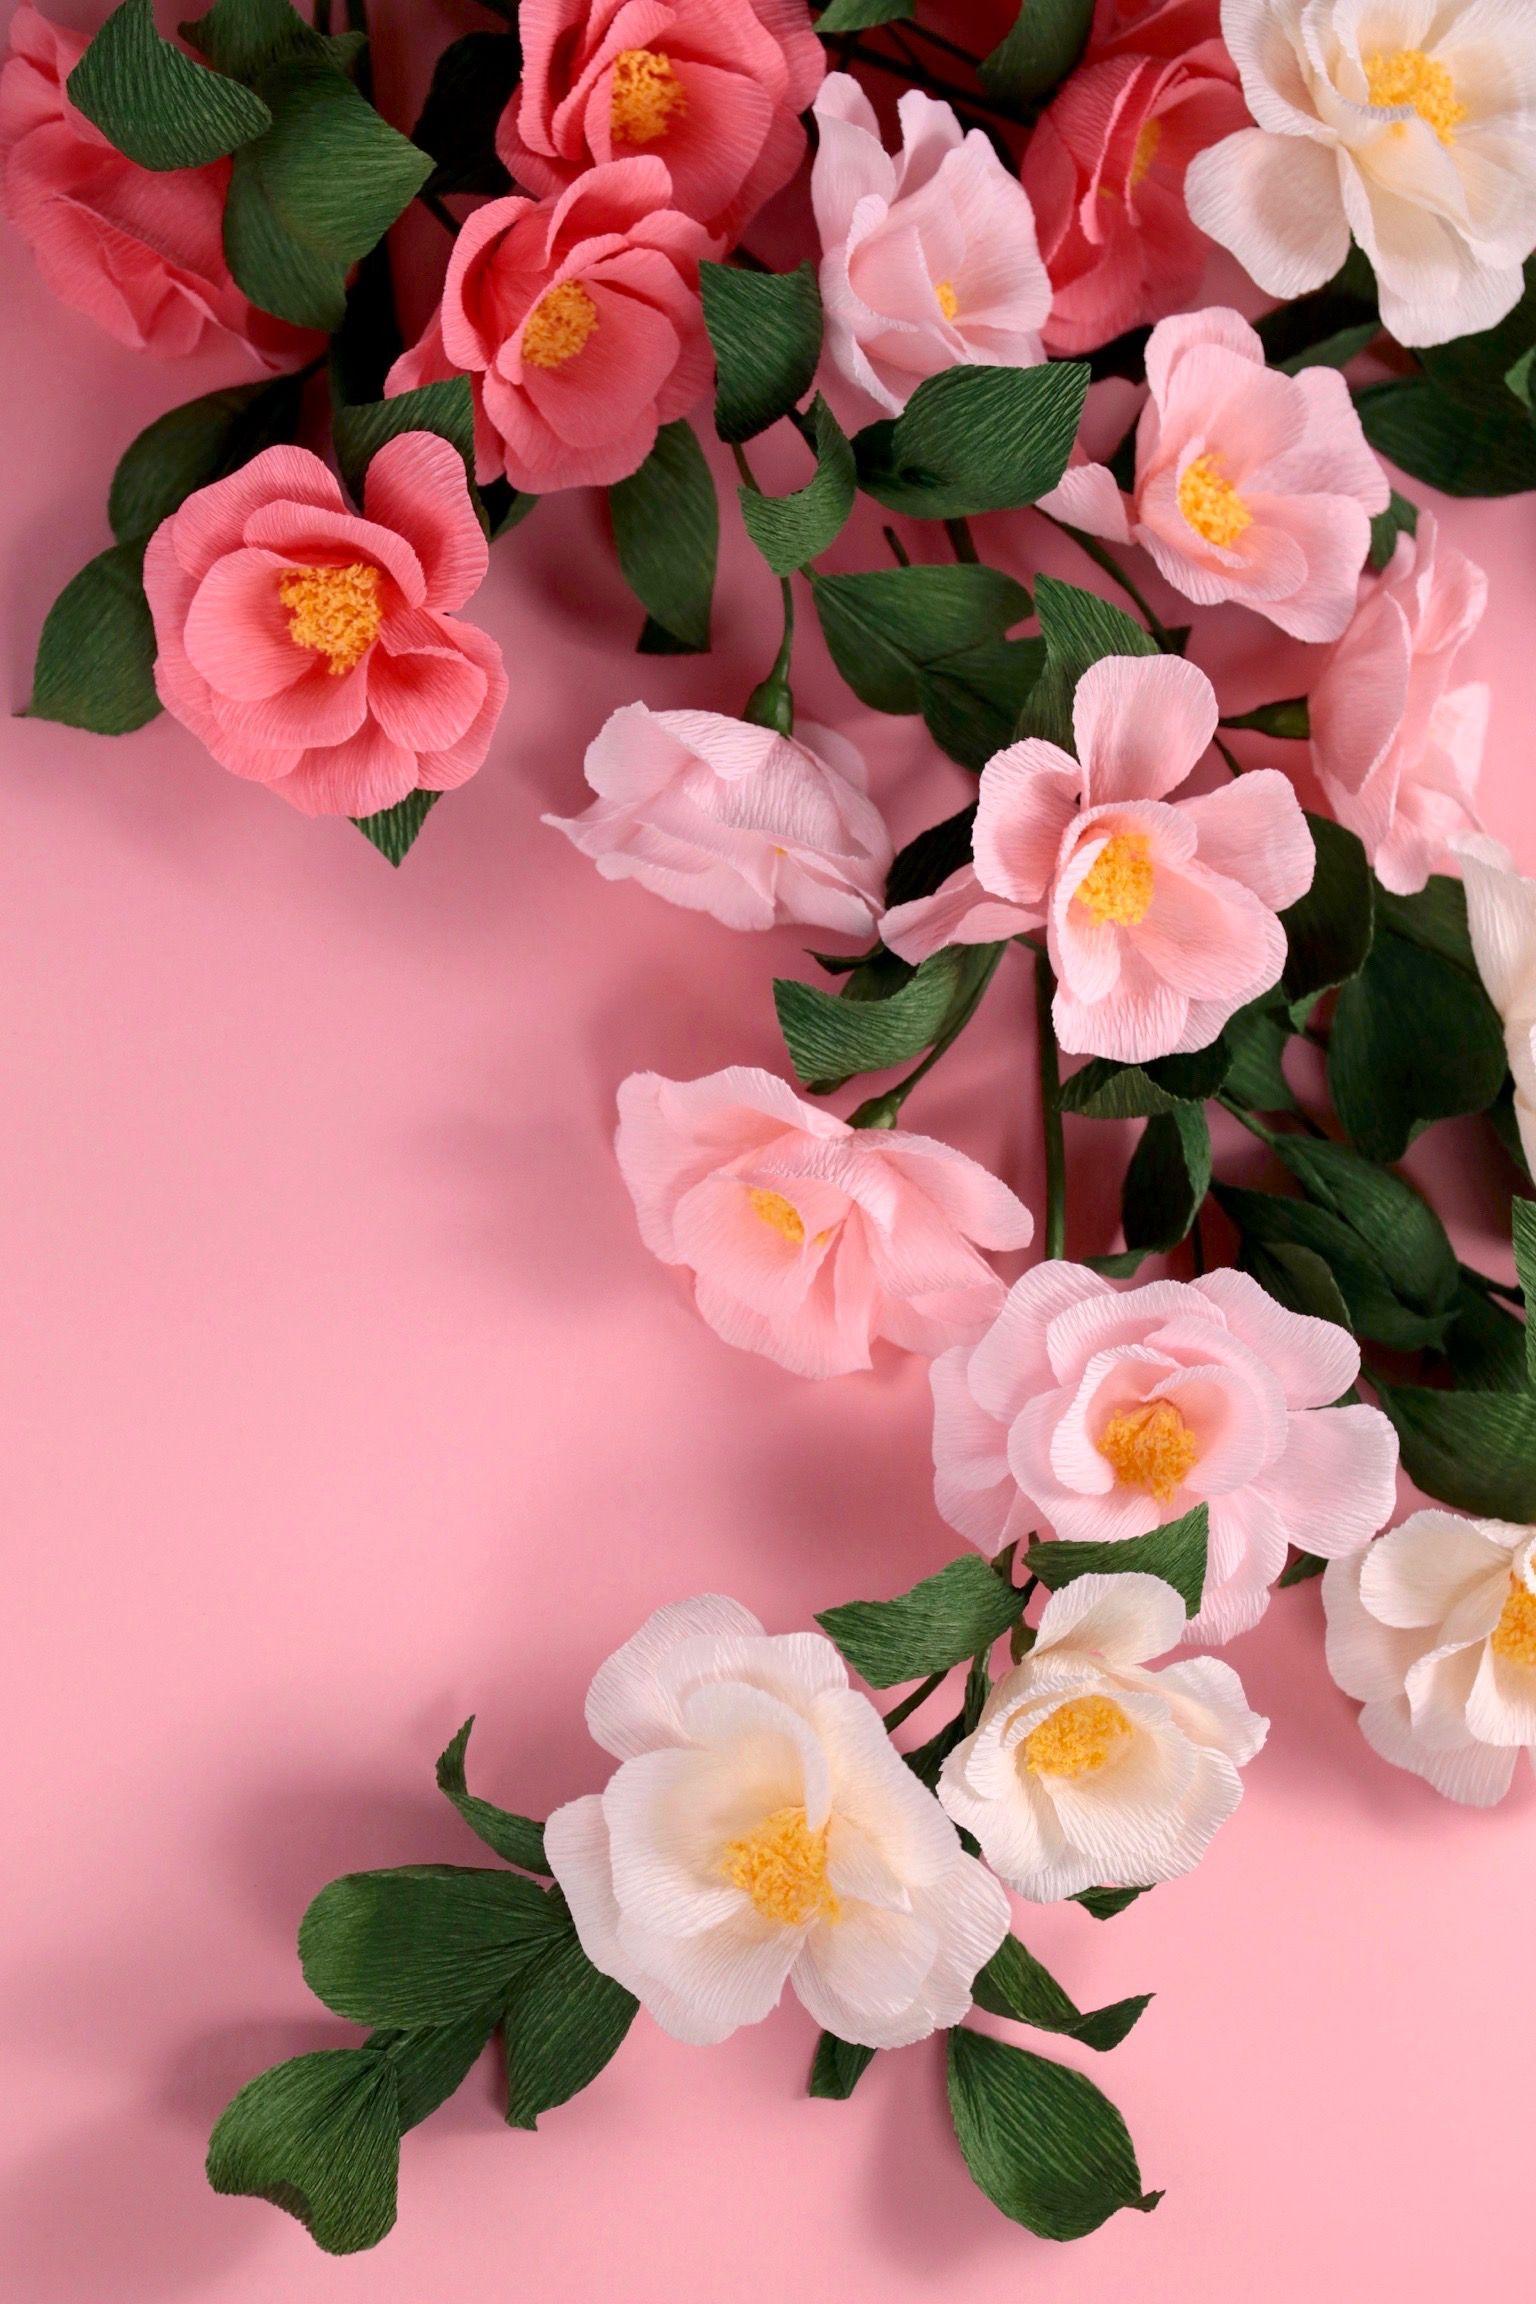 Diy Paper Camellia With Jennifer Tran Camellia Diy Paper And